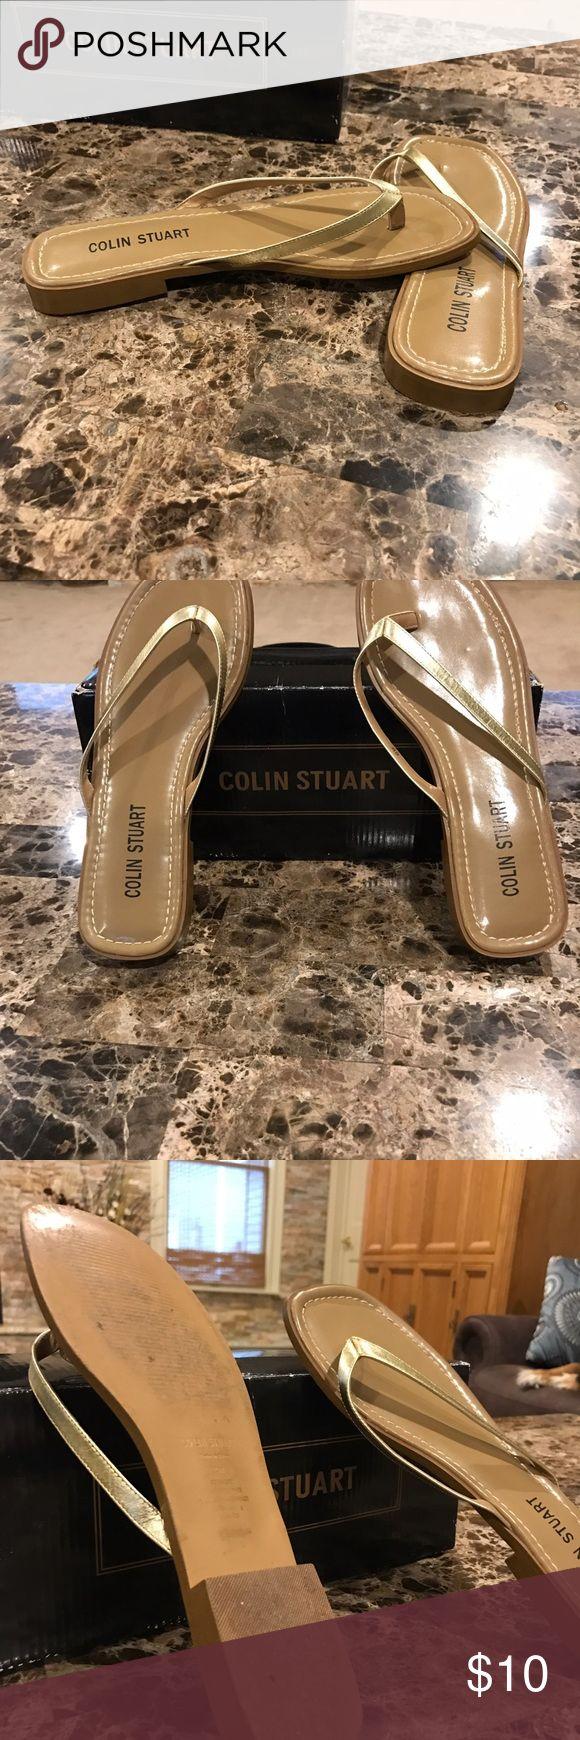 Colin Stuart Gold Thong Sandals size 8 EUC worn one time very pretty Colin Stuart Shoes Sandals